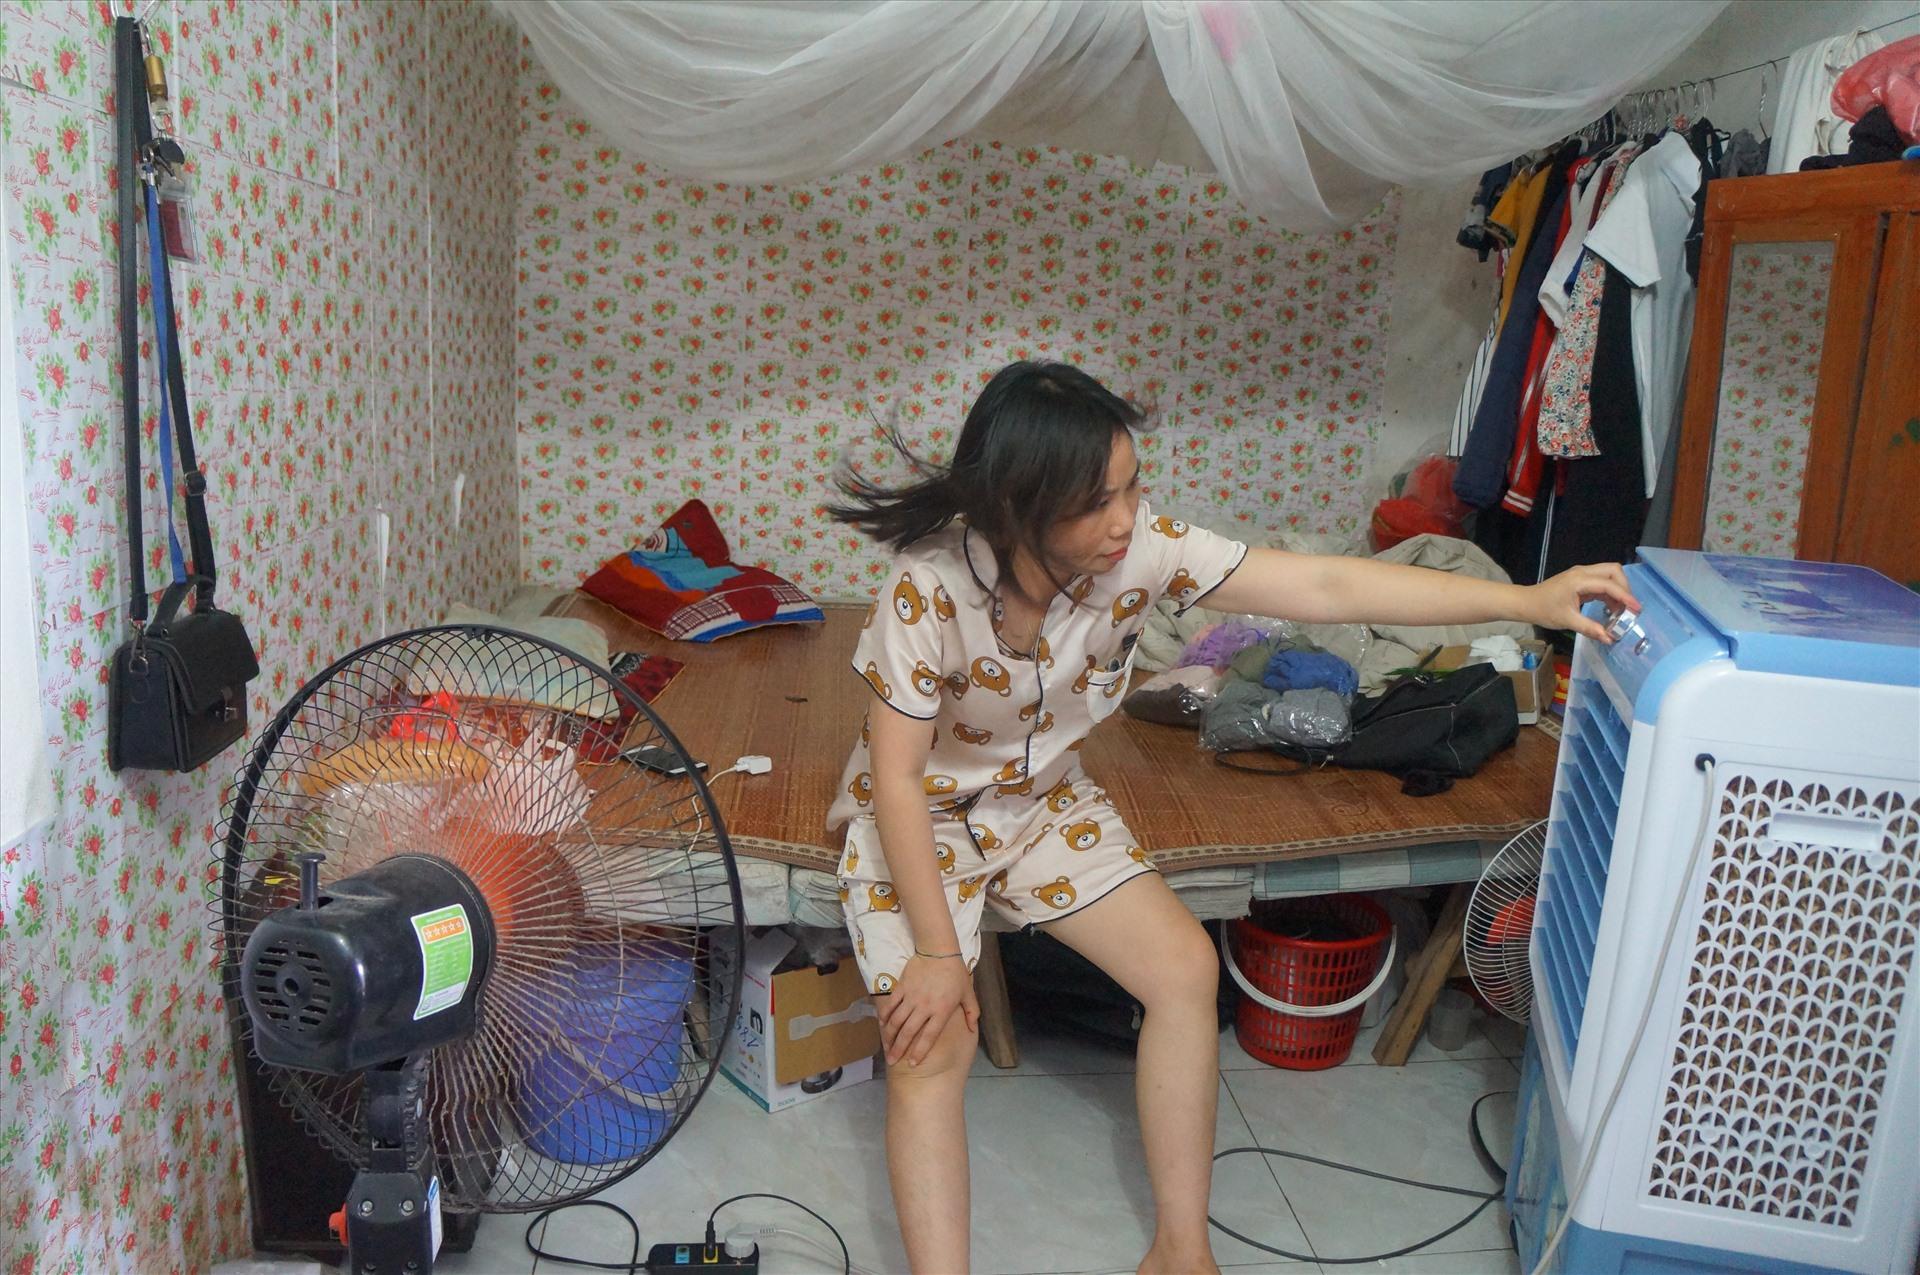 cong nhan chat vat chong choi voi nang nong